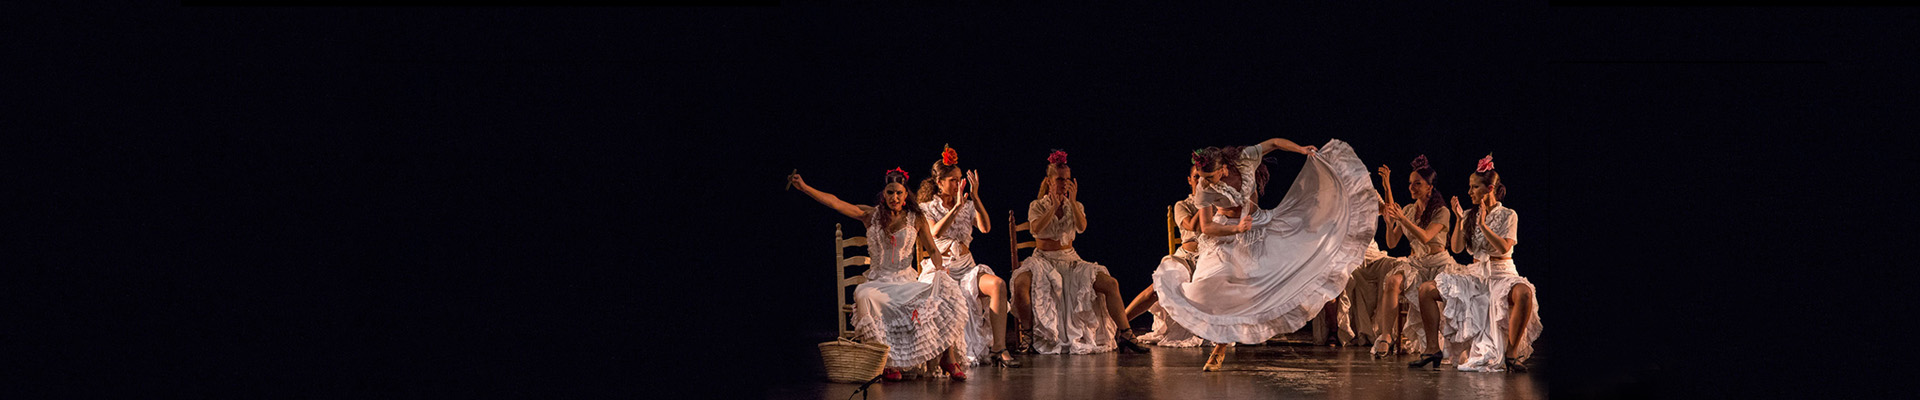 flamenco espectáculo